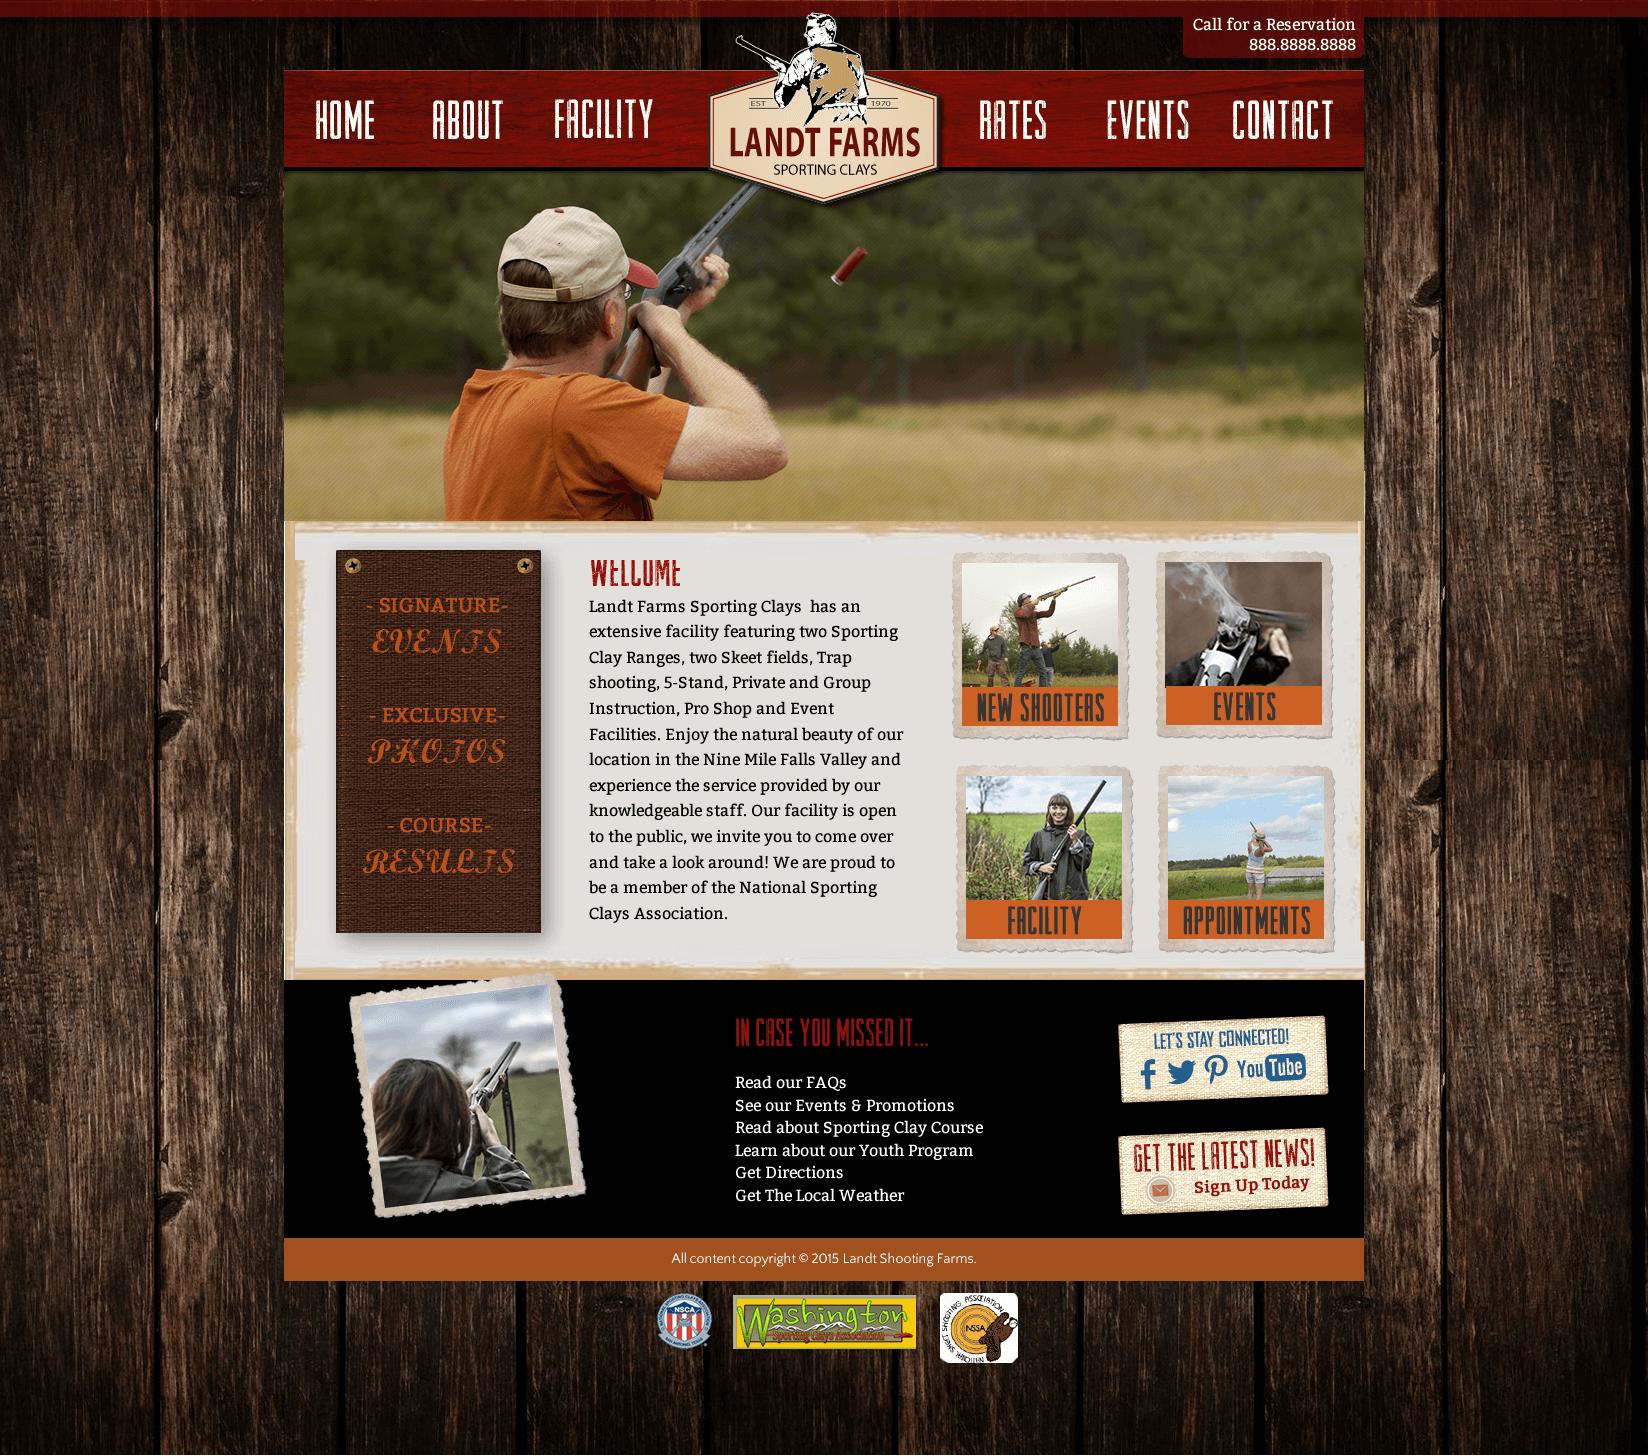 Land-Shotgun-Clay-Shooting-Course-Website-Design-Home-Page